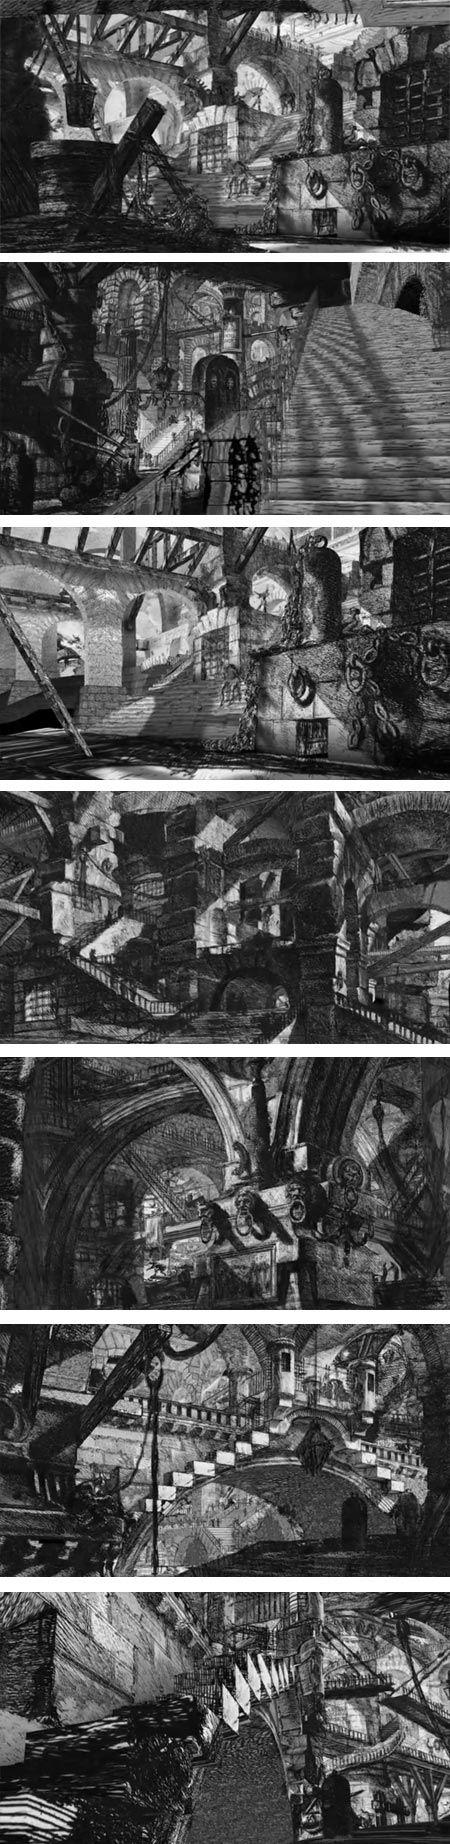 Piranesi's Carceri d'invenzione animated, Grégoire Dupond